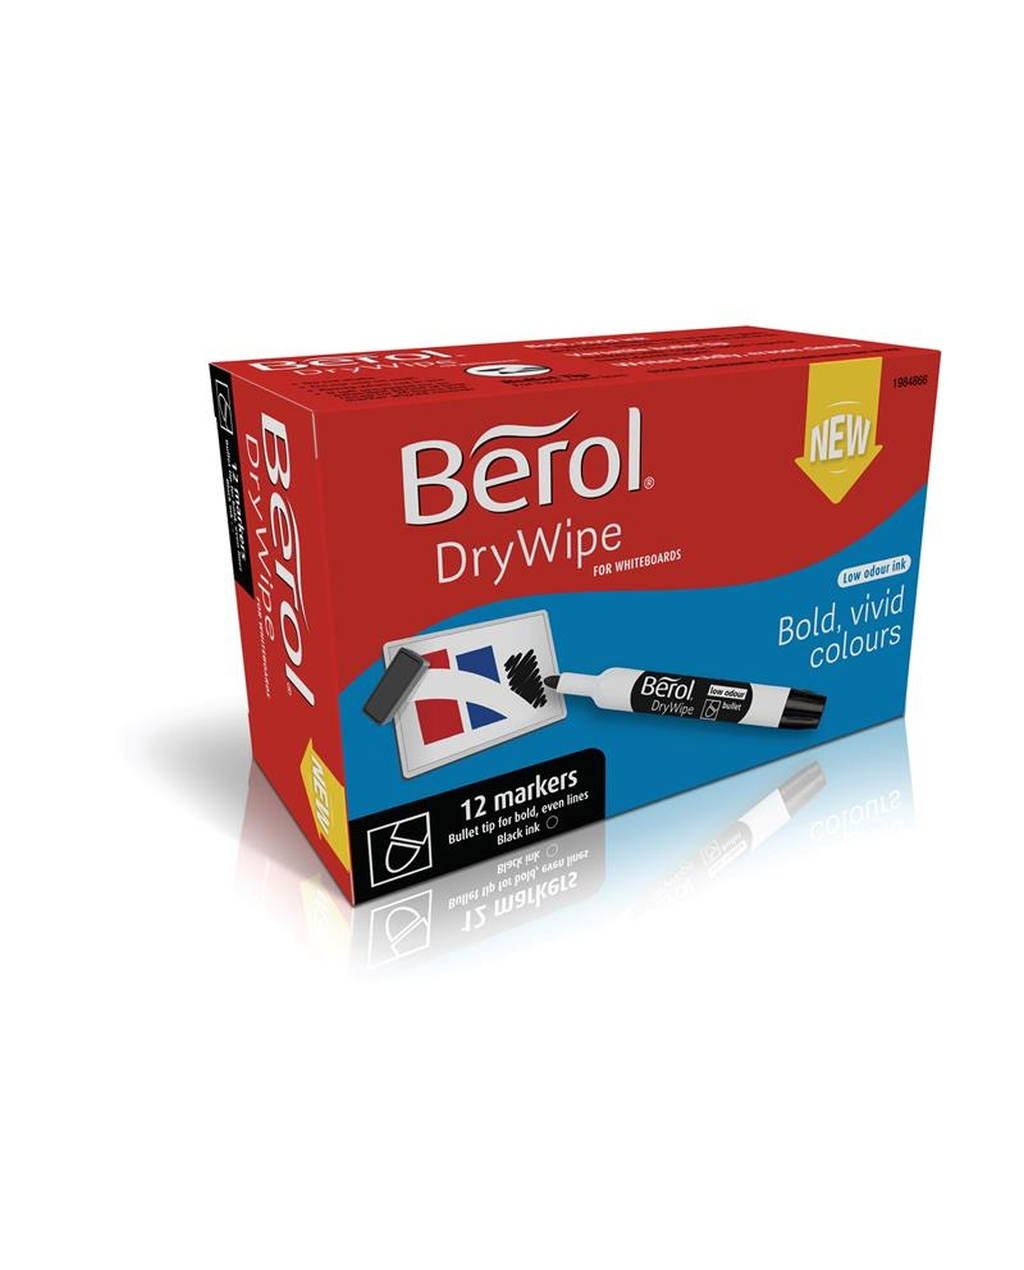 Berol Drywipe Marker Bullet Tip - Black